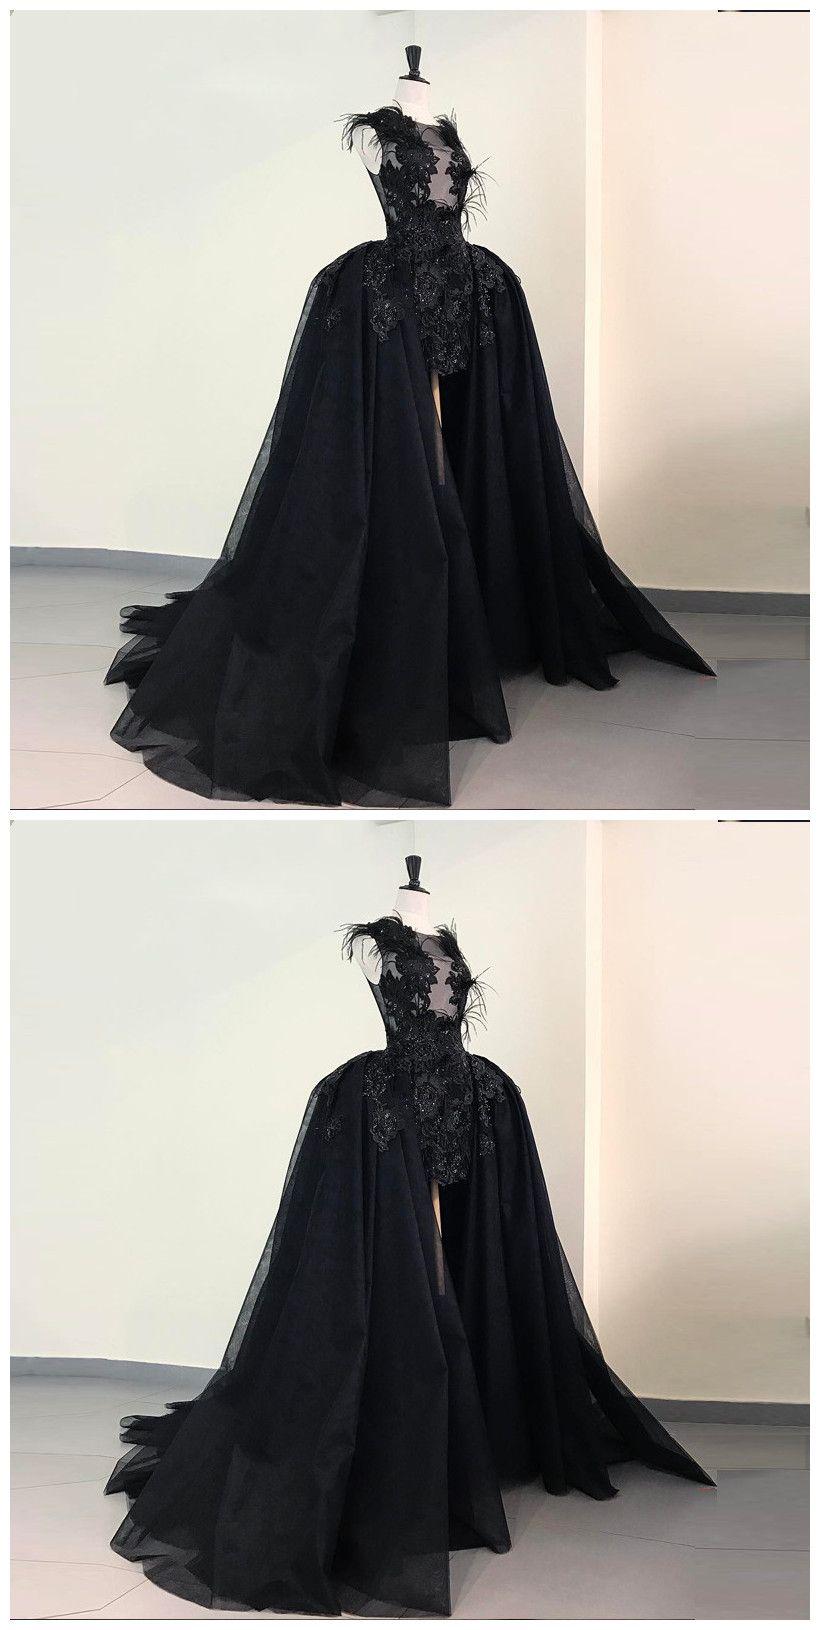 A Line Beaded Detachable Train Black Prom Dress With Feathers Appliques Dark Wedding Dress Dresses Prom Dresses [ 1630 x 820 Pixel ]